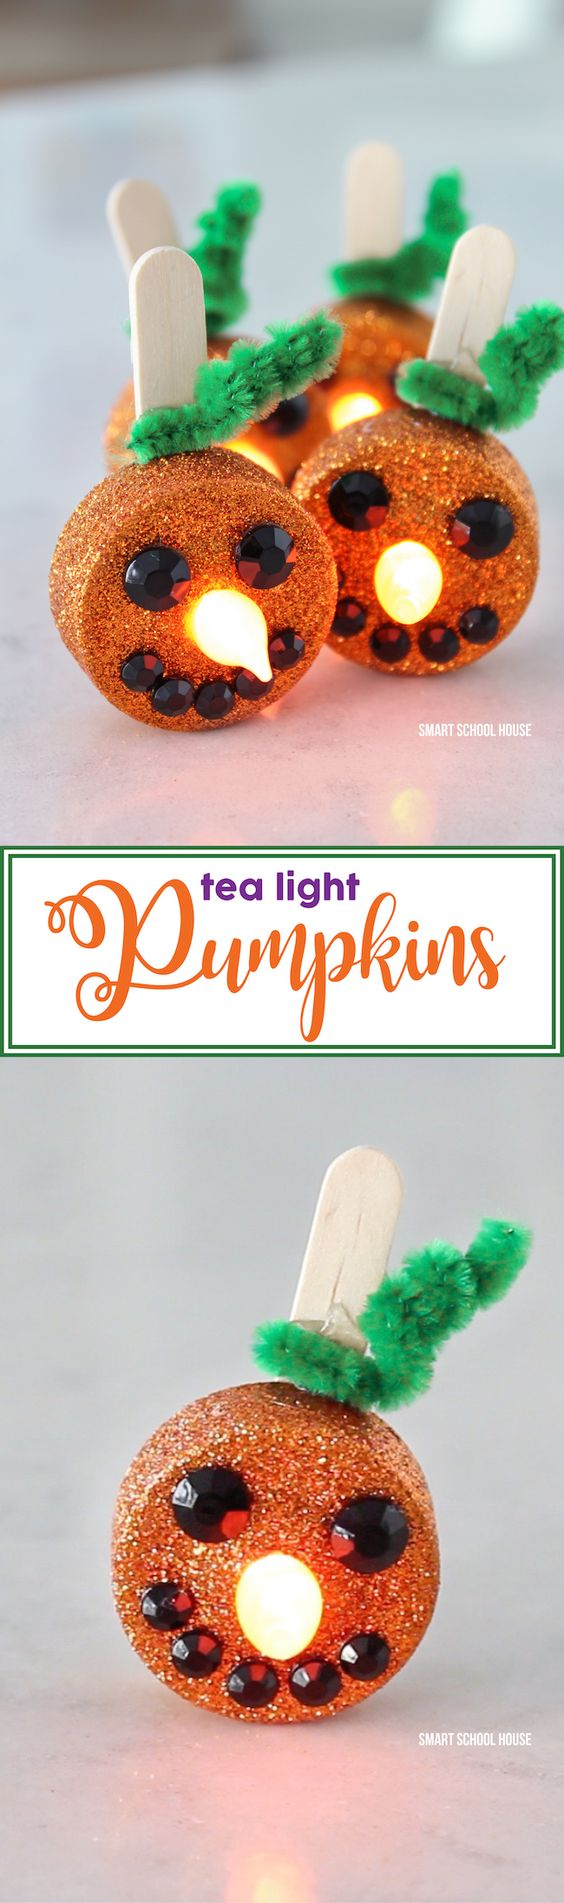 DIY Tea Light Pumpkins for Kids